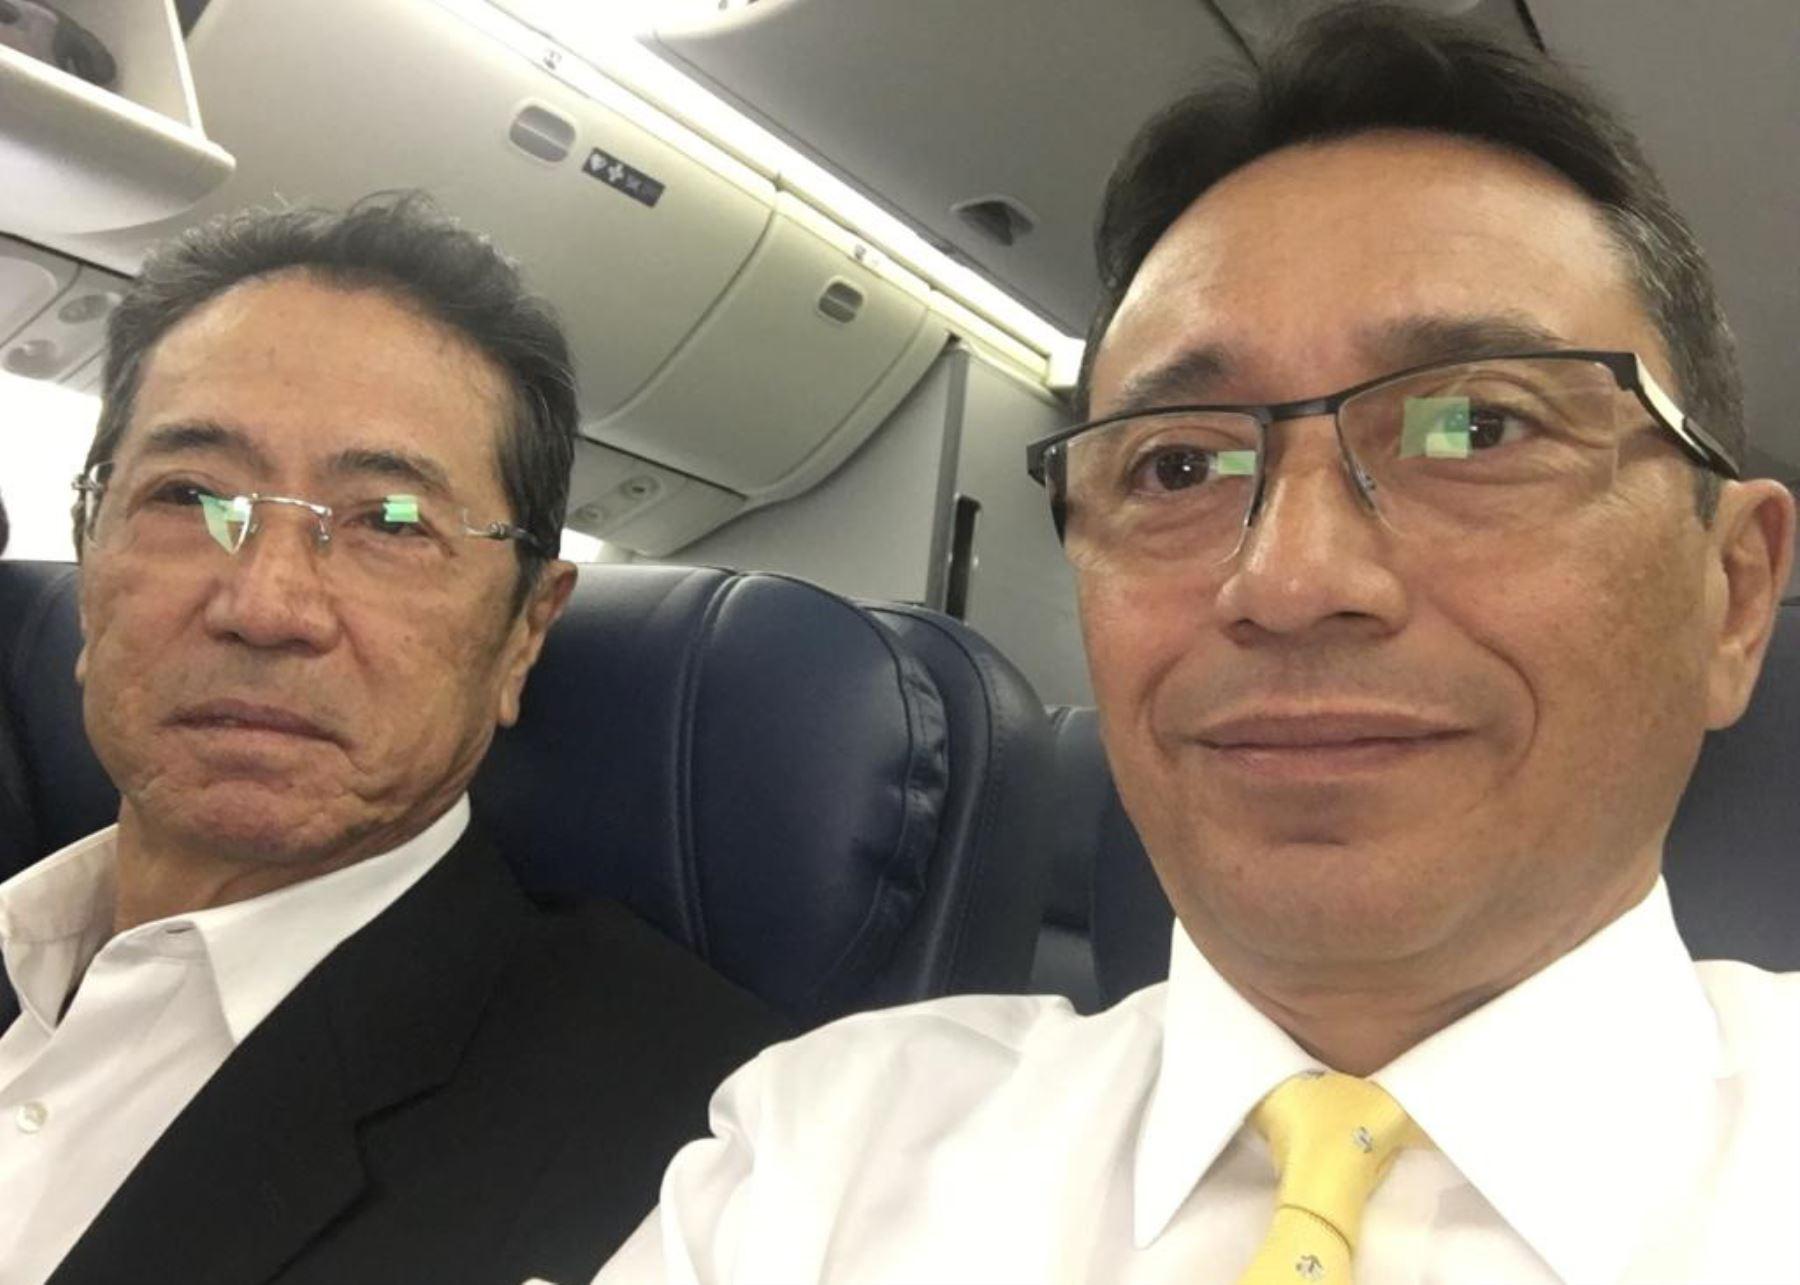 Jaime Yoshiyama y su abogado Humberto Abanto.